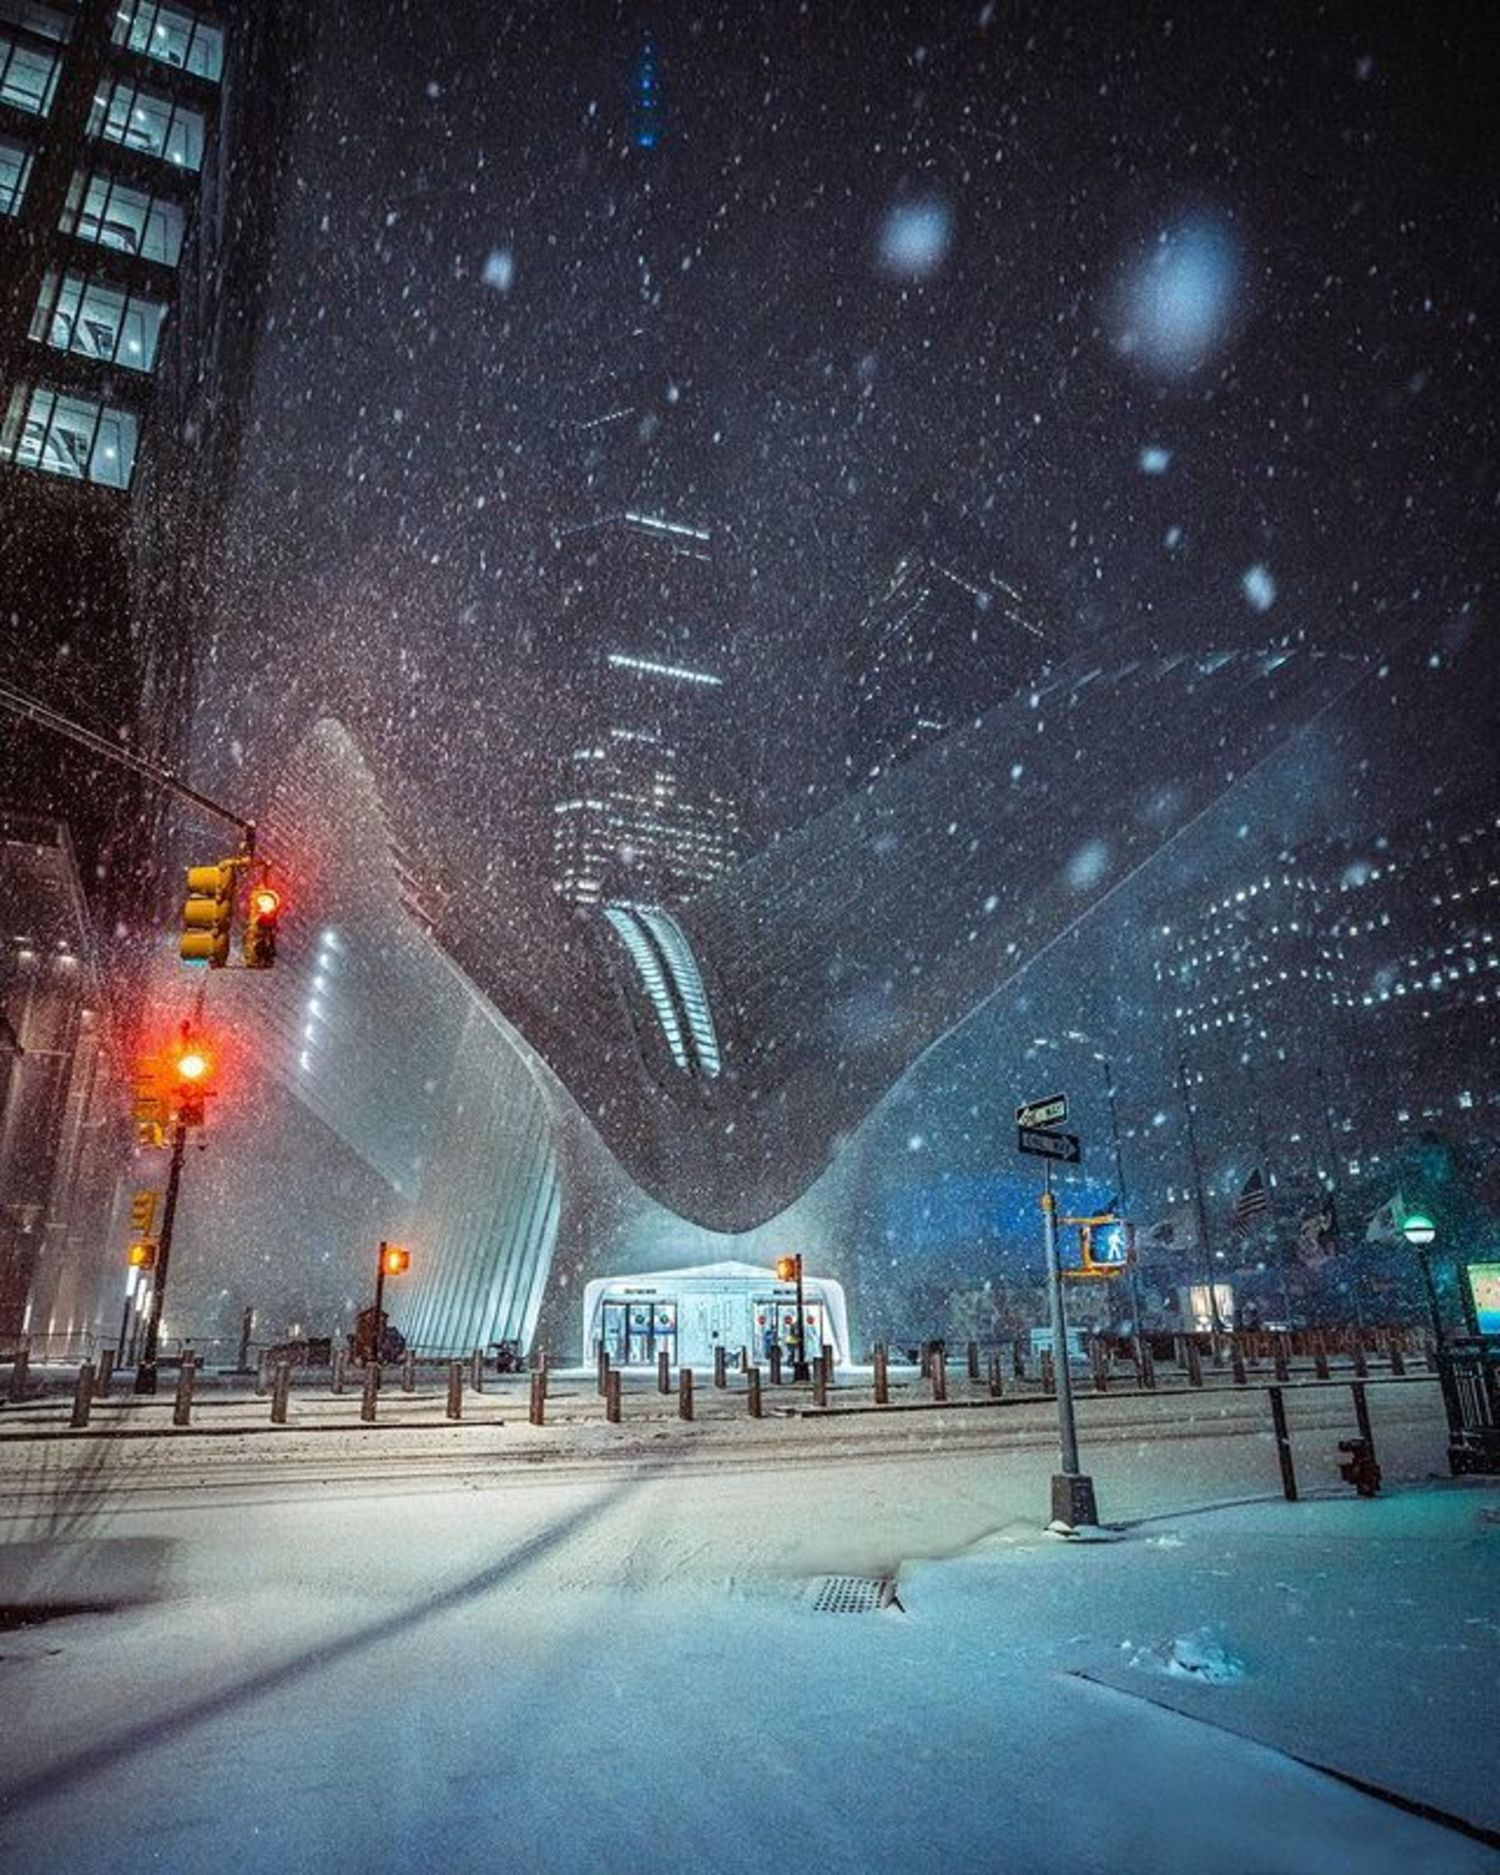 World Trade Center Transportation Hub, Financial District, Manhattan